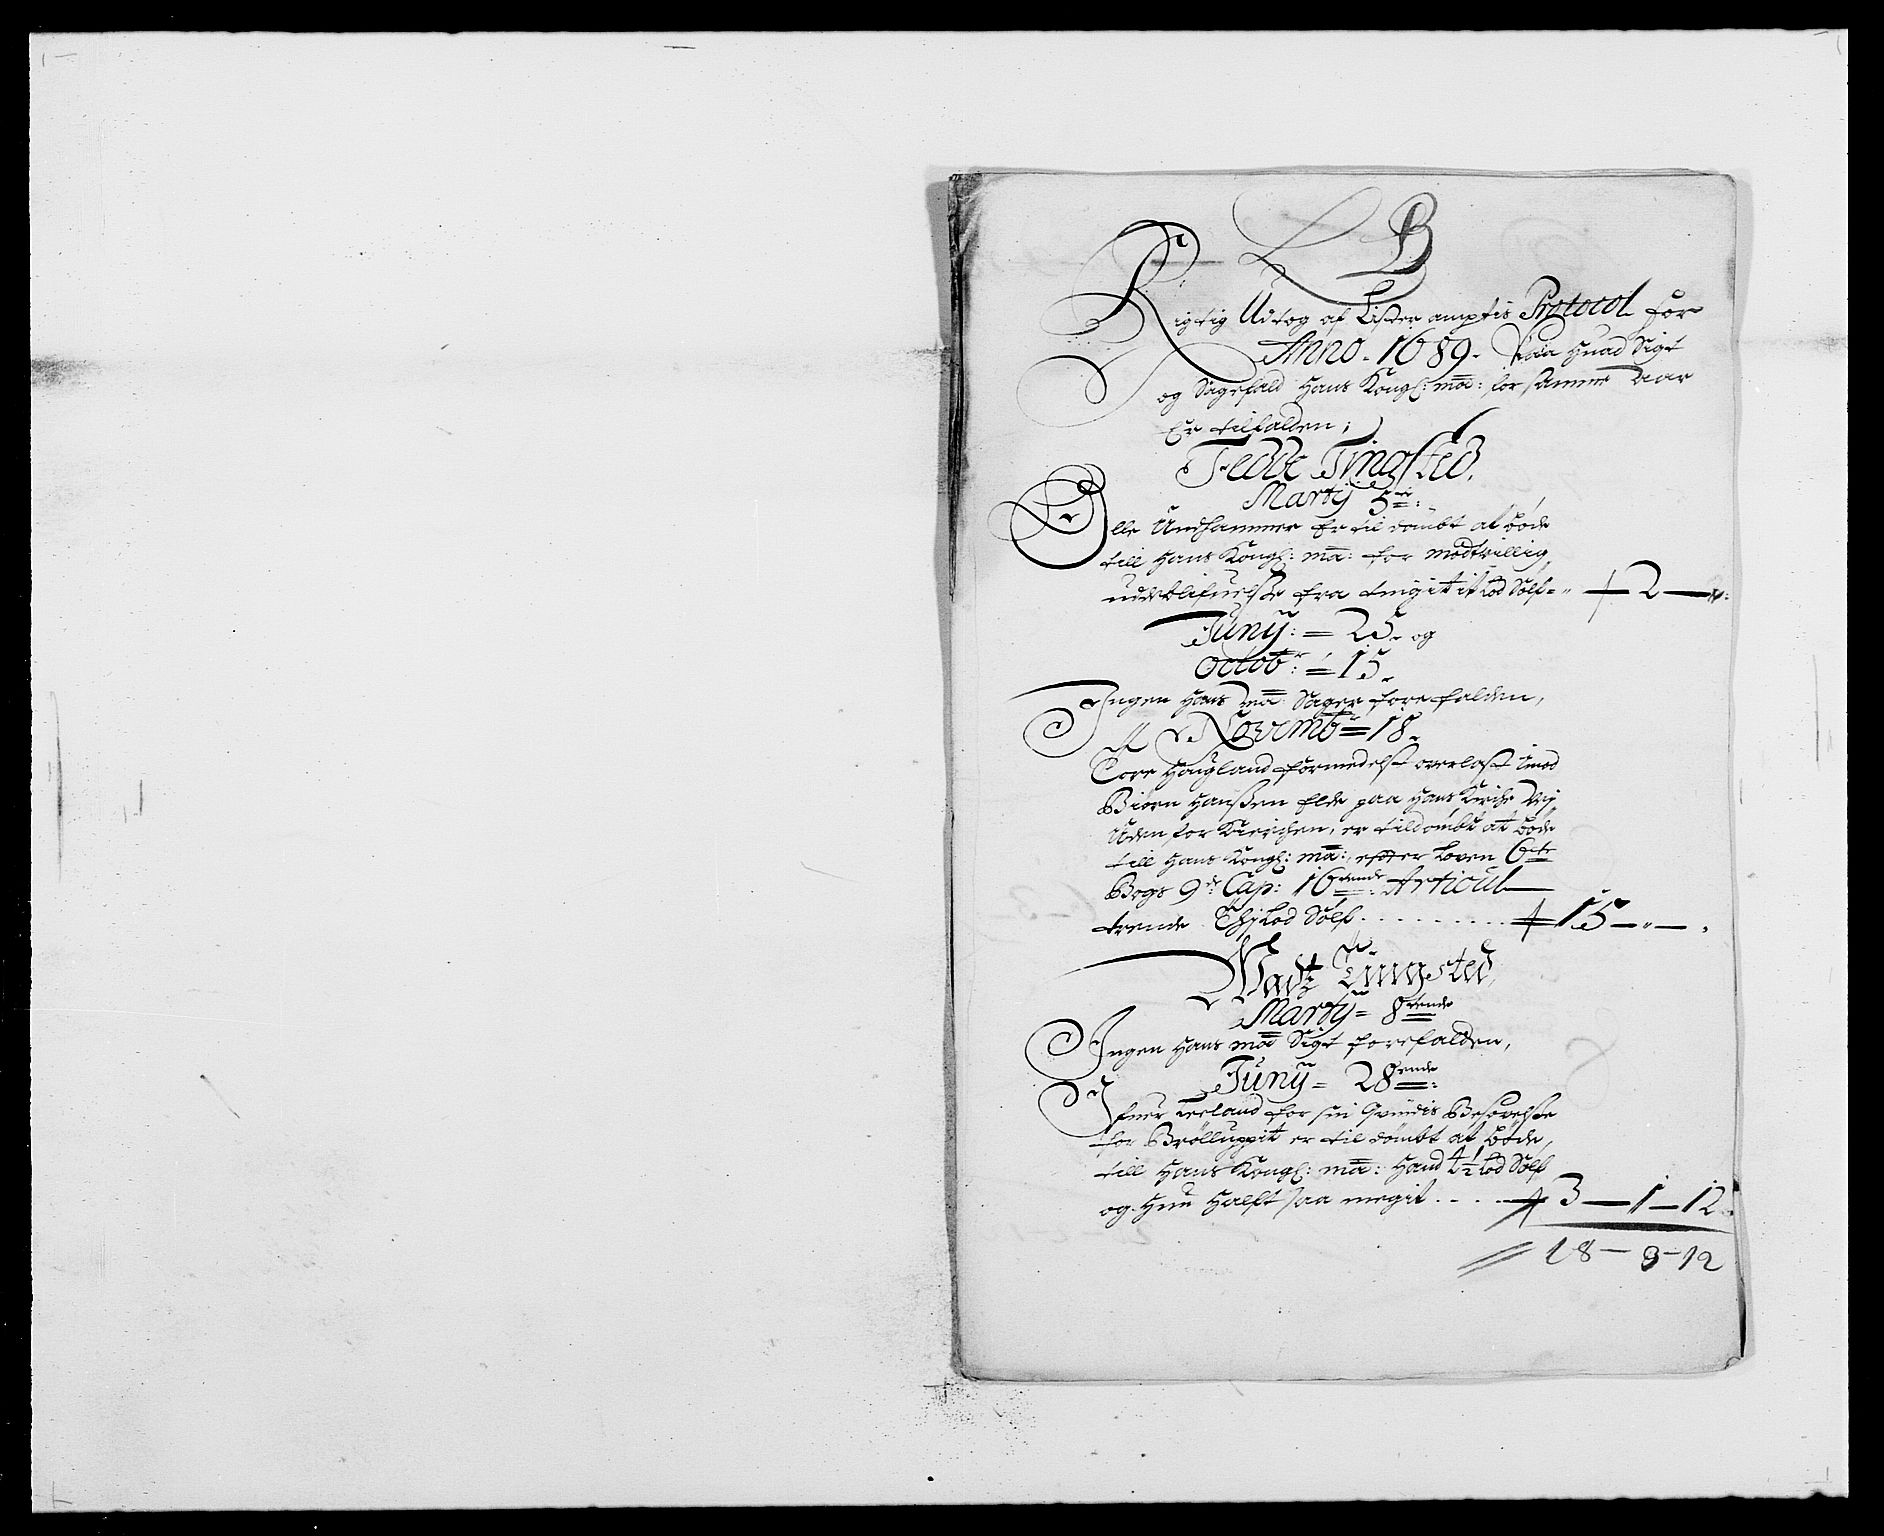 RA, Rentekammeret inntil 1814, Reviderte regnskaper, Fogderegnskap, R41/L2535: Fogderegnskap Lista, 1686-1689, s. 11